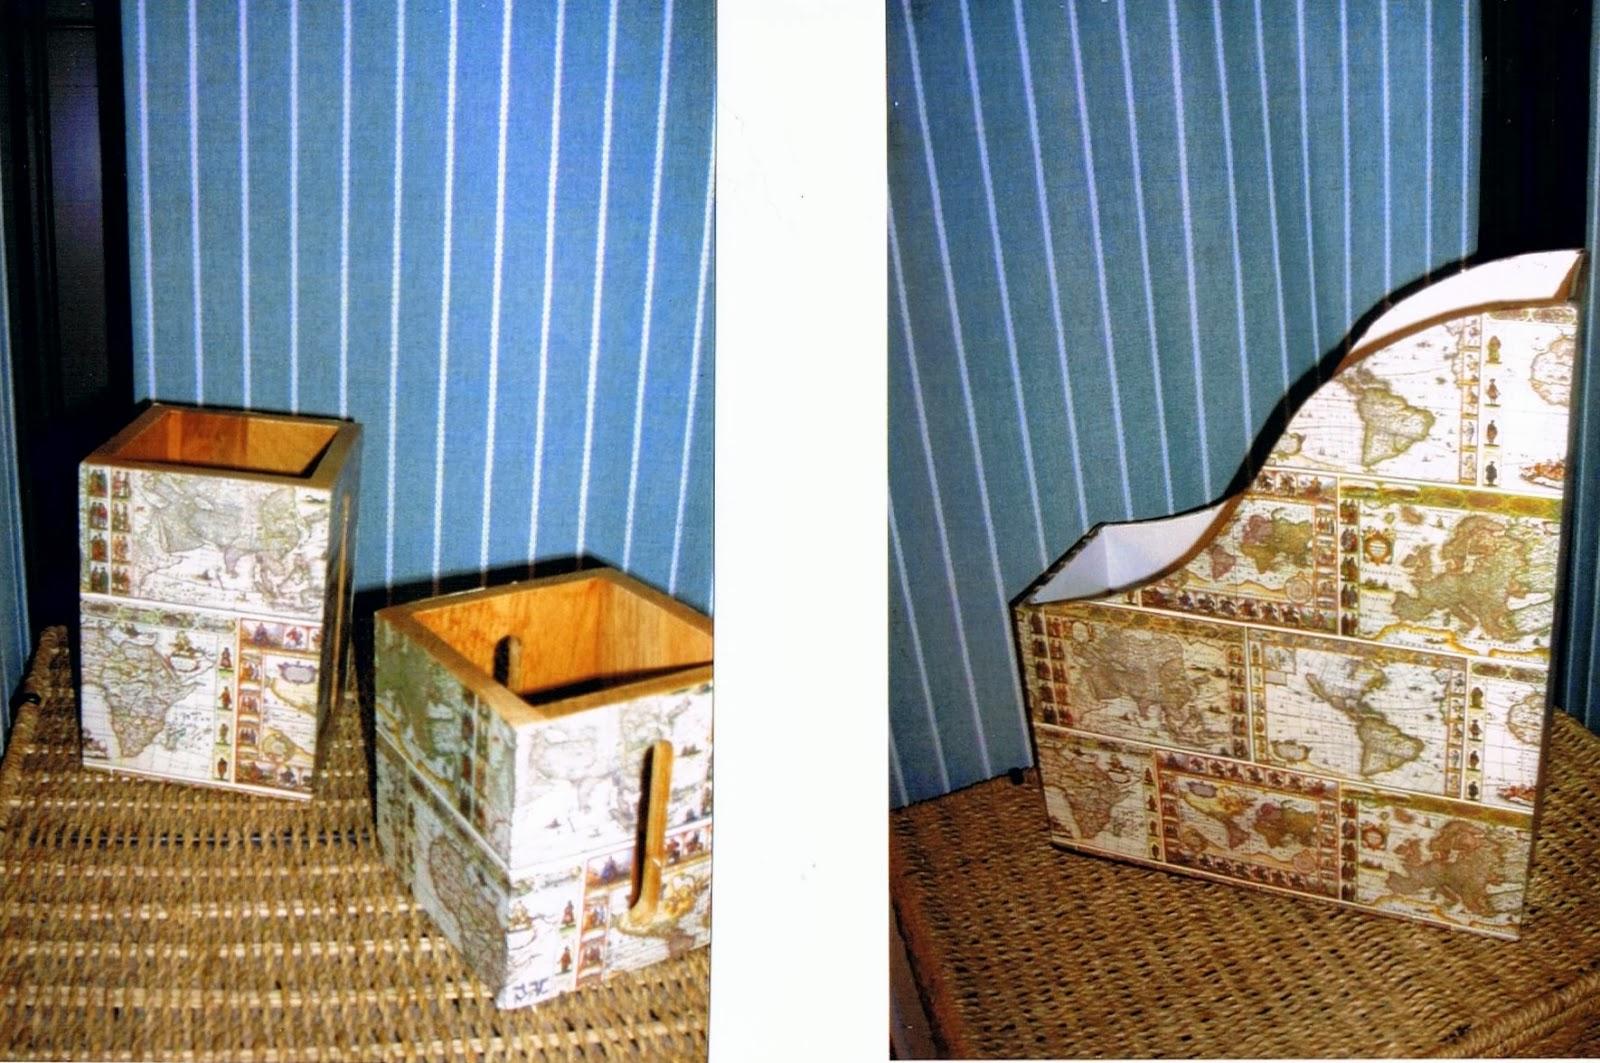 Hecho en casa de julia revisteros madera - Hacer boligrafos en casa ...